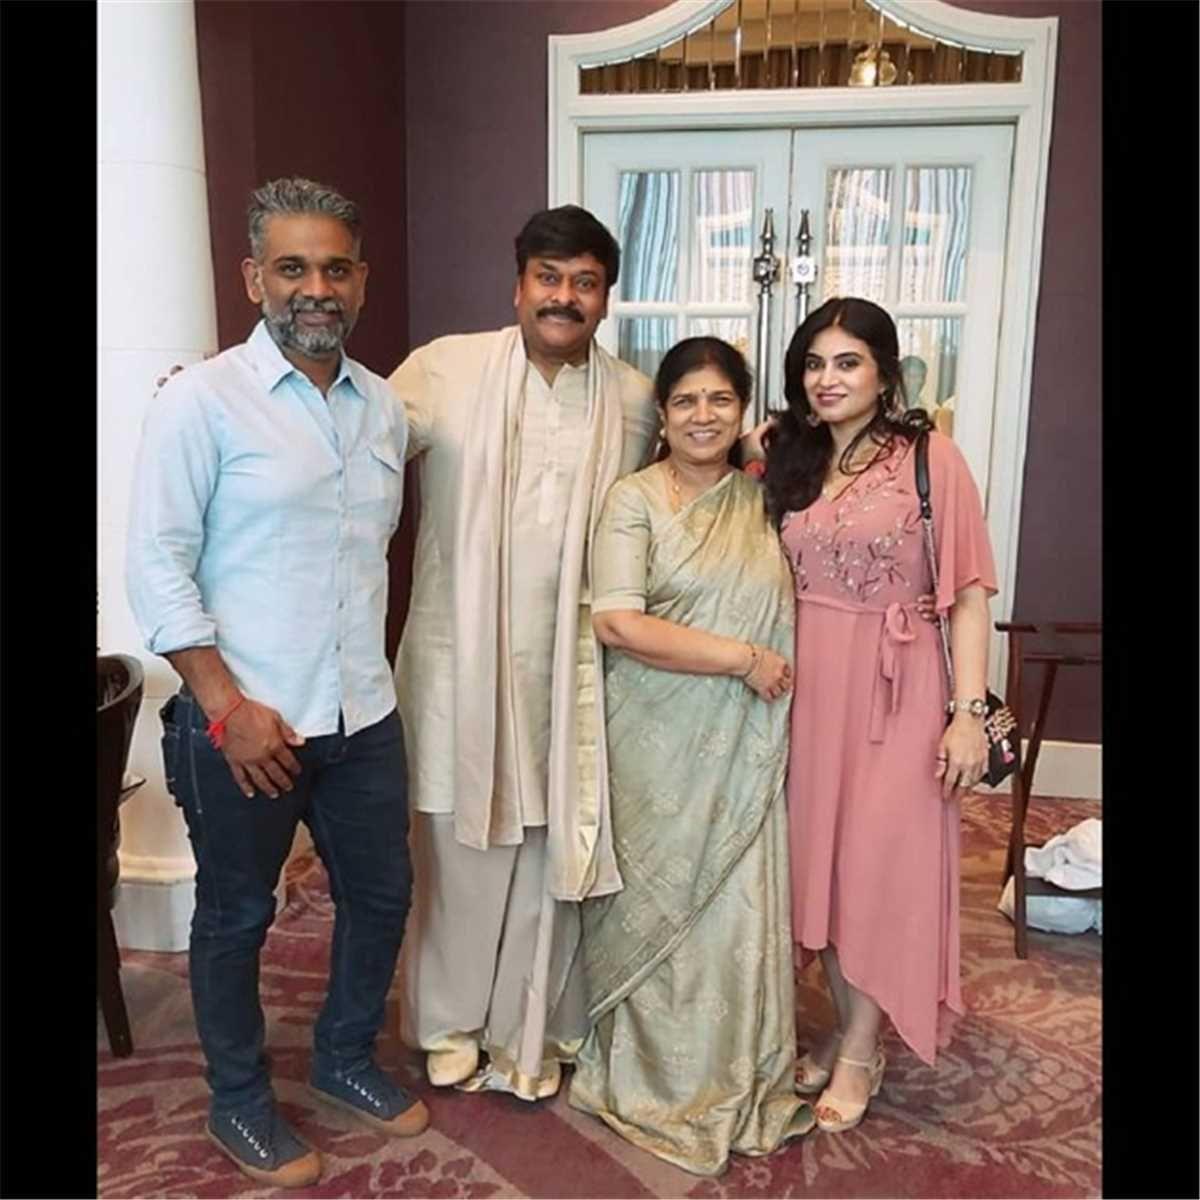 Allu Arjun's elder brother Allu Bobby and his wife Neela